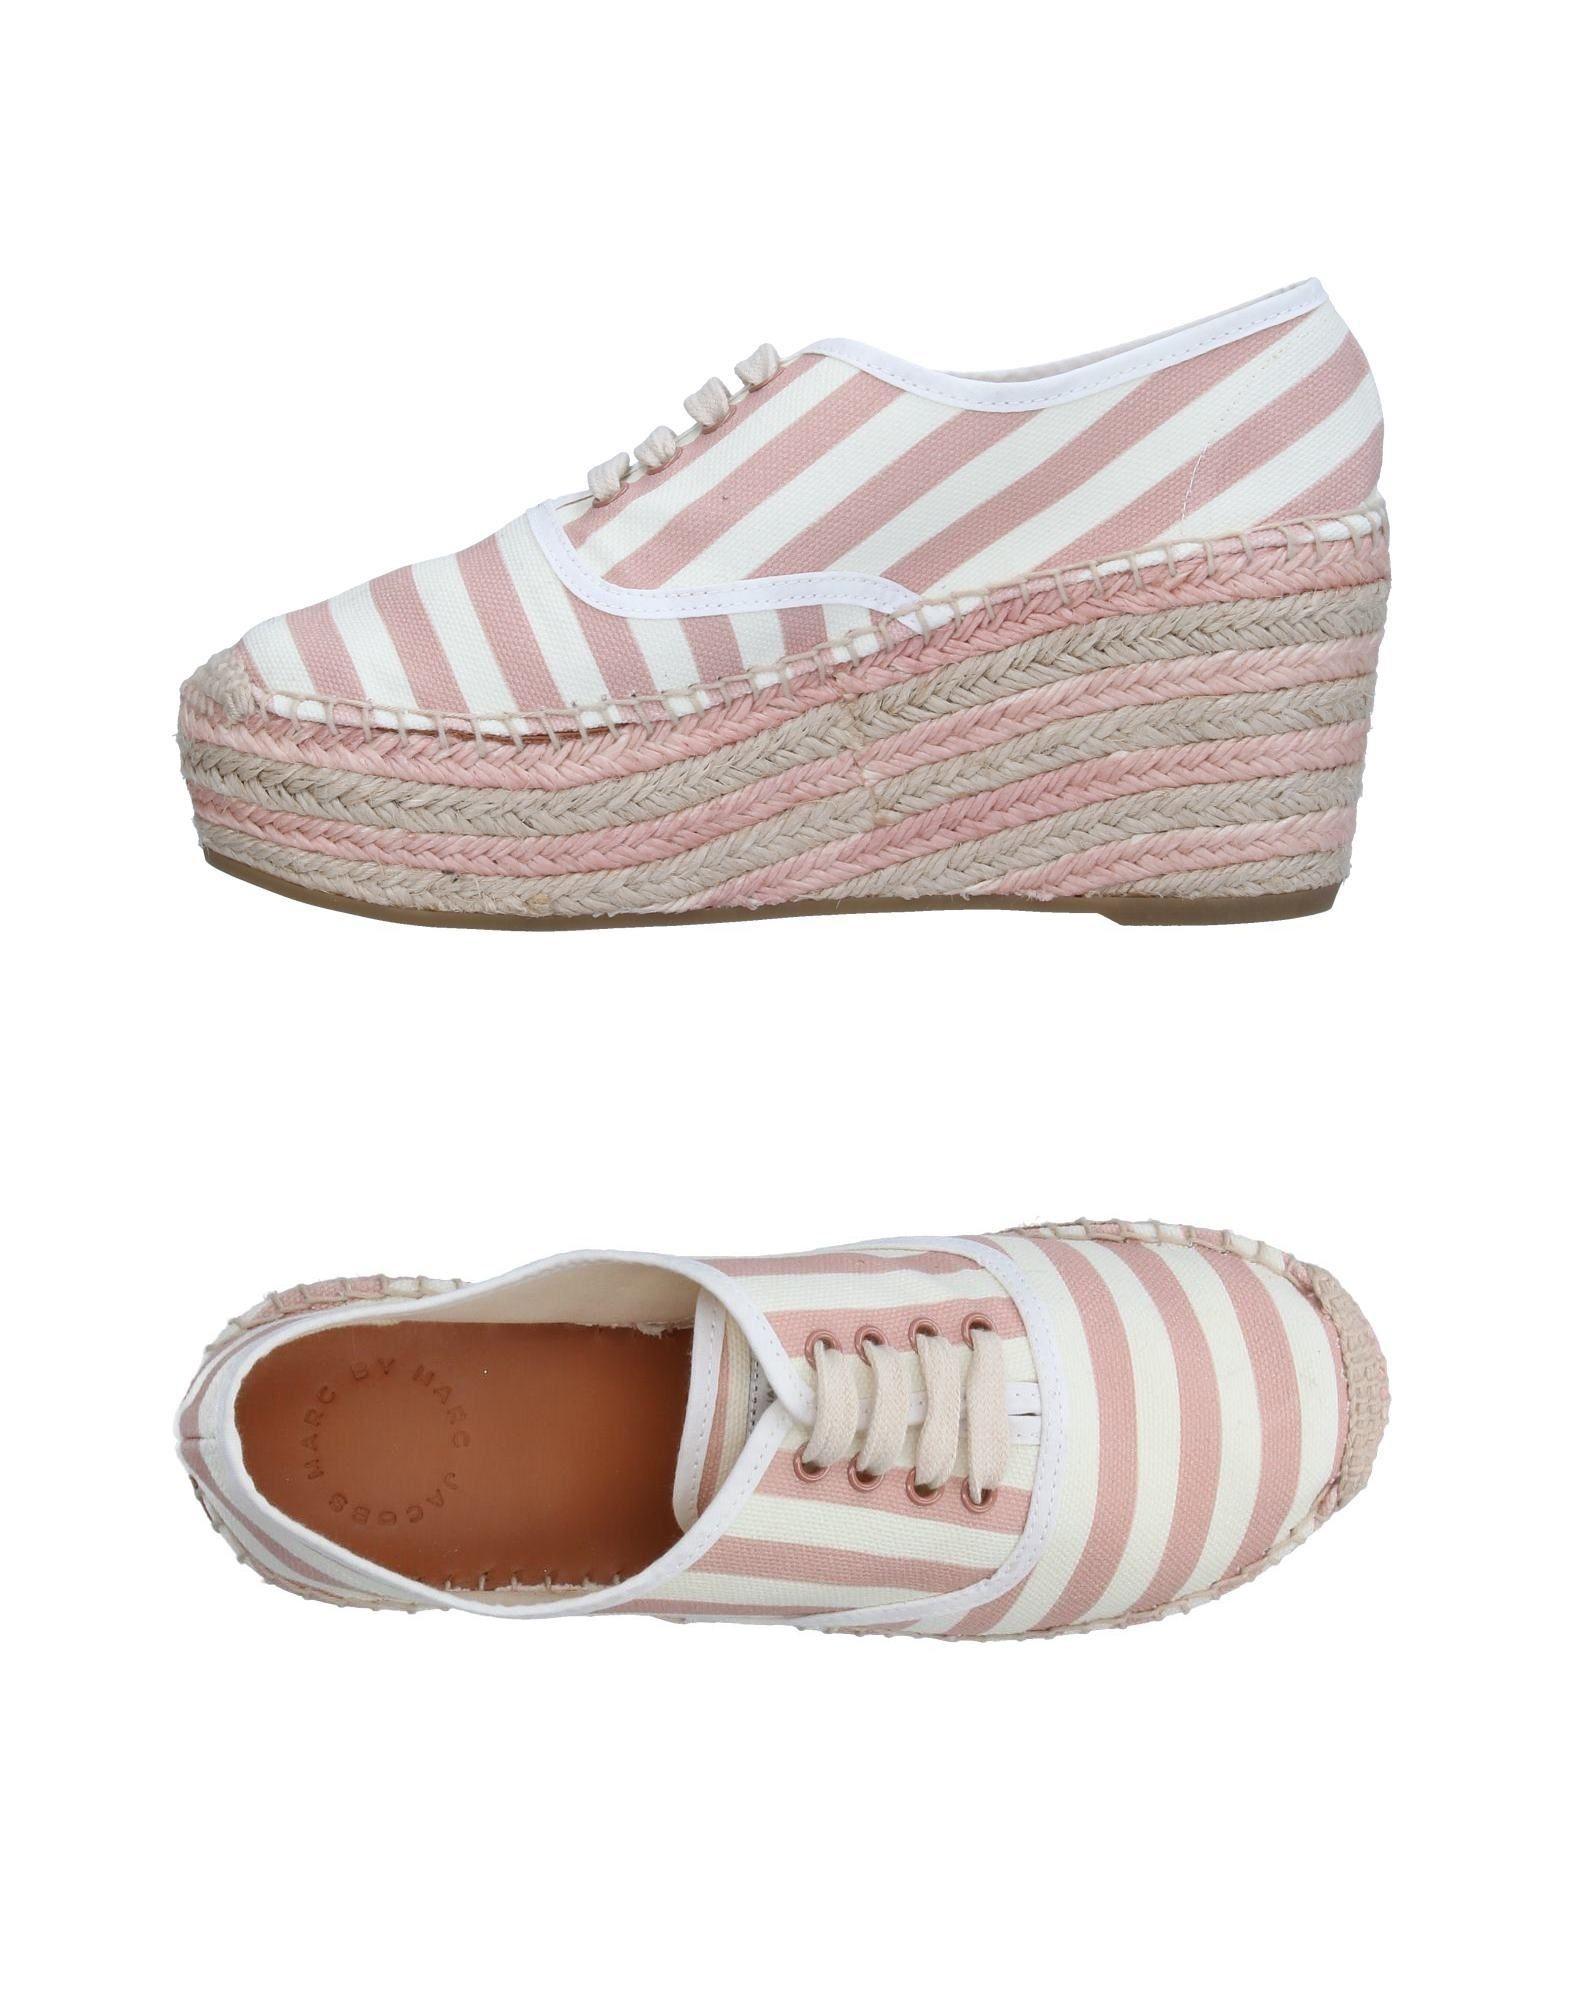 MARC BY MARC JACOBS Обувь на шнурках цены онлайн